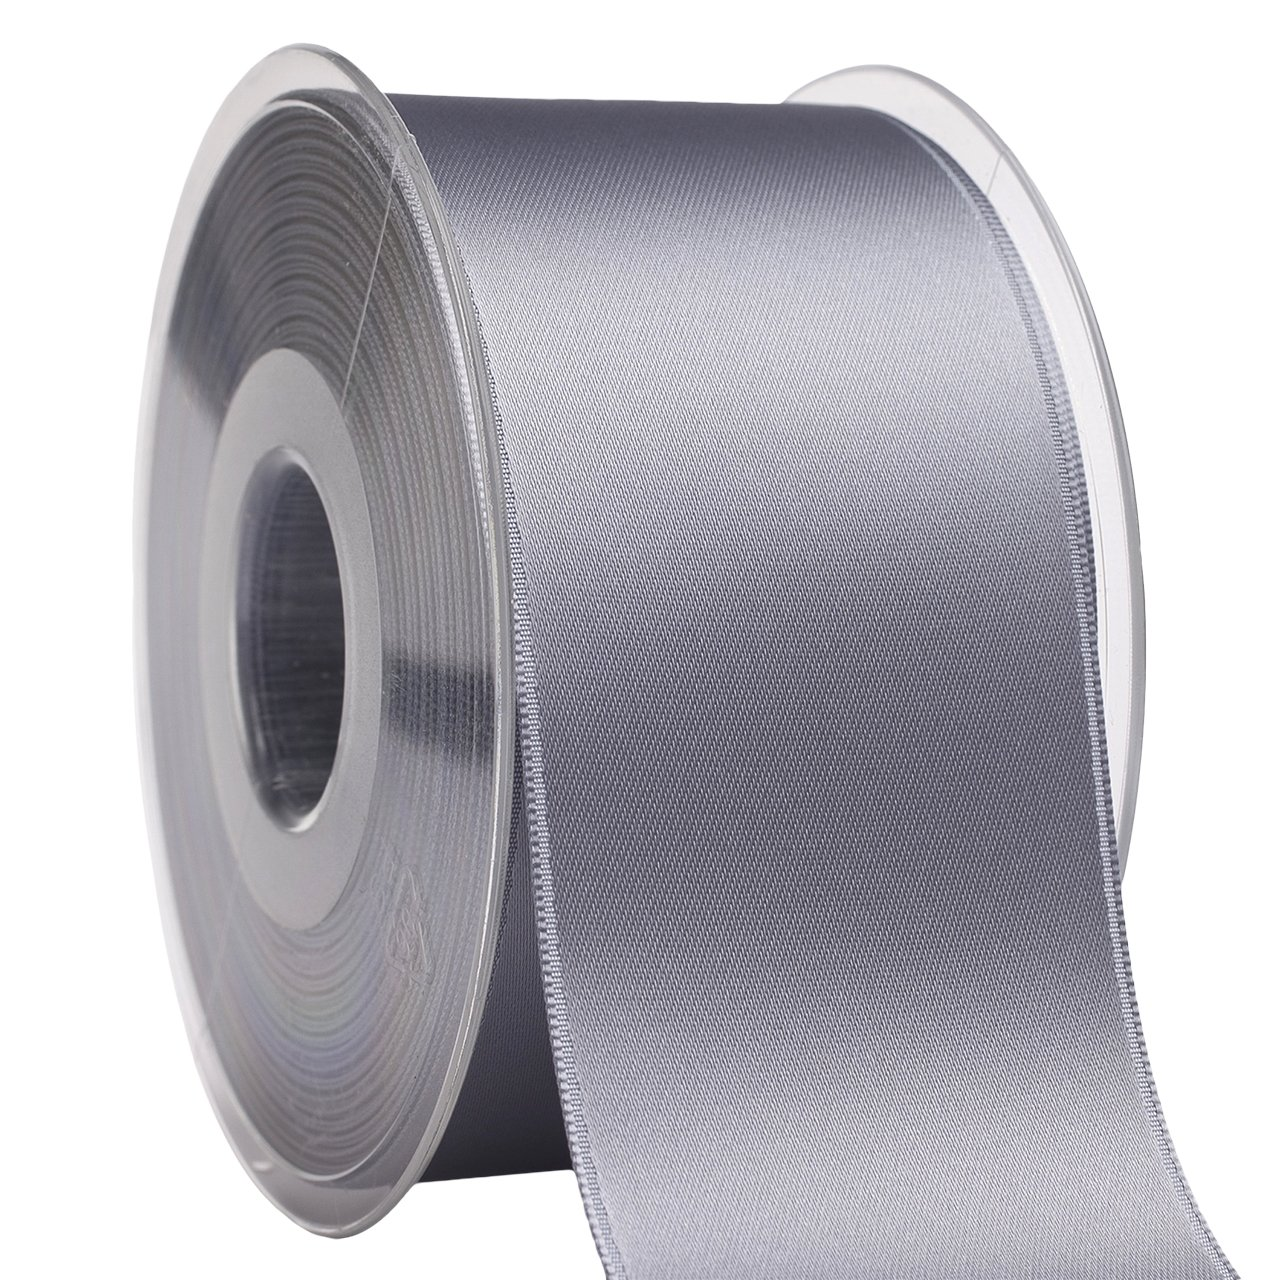 035 Swiss Satin 03550/25-036 Fabric Ribbon, 2'' x 27 yd, Grey